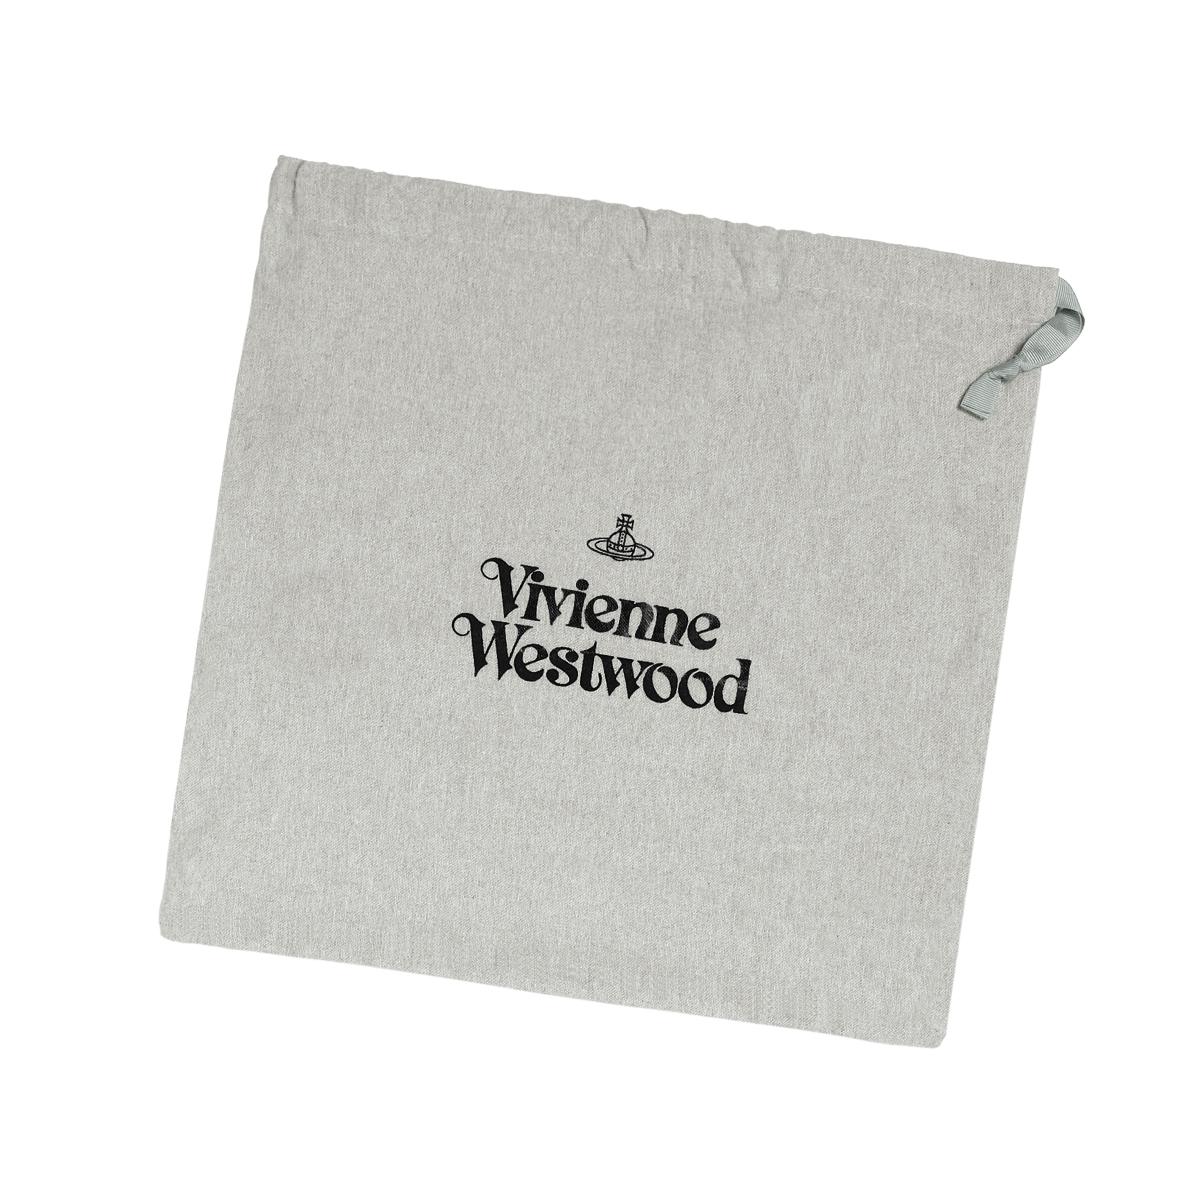 VIVIENNE WESTWOOD ヴィヴィアン ウエストウッド | ショルダーバッグ | POLLY ポリー